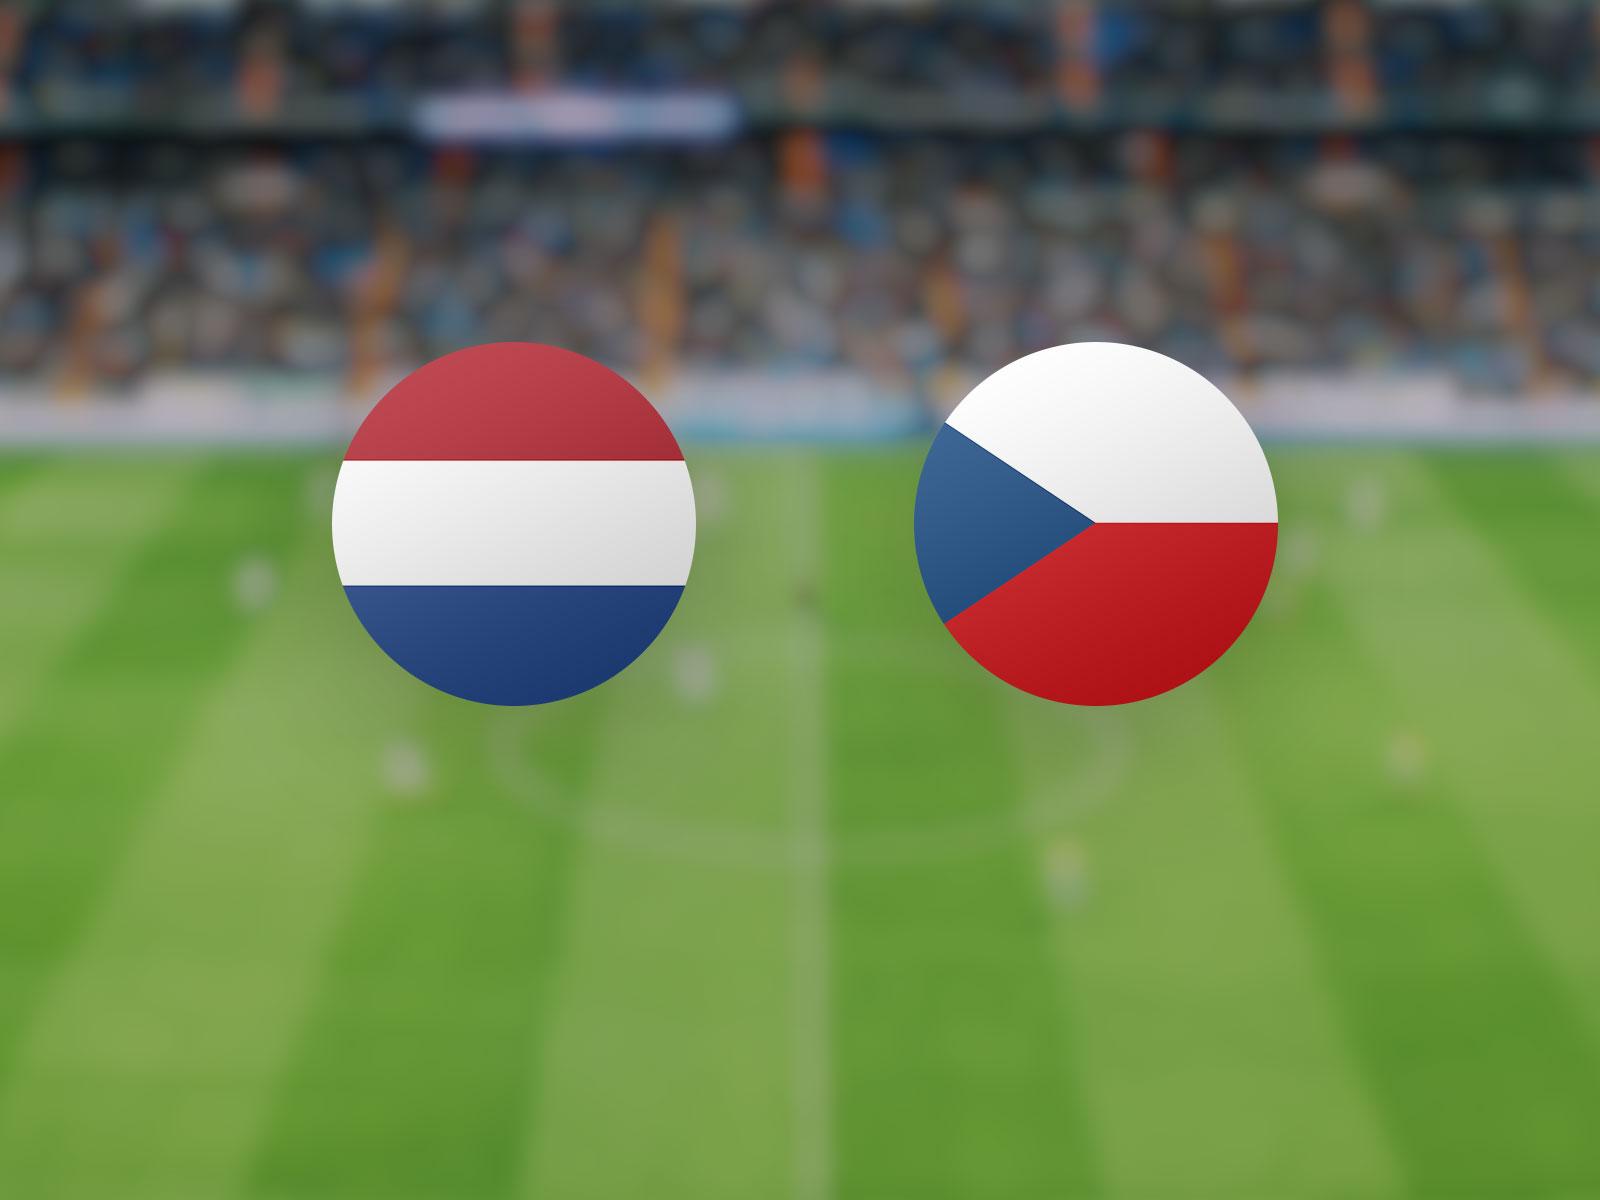 watch Netherlands vs Czech Republic in Euro 2020 last-16 knockout rounds